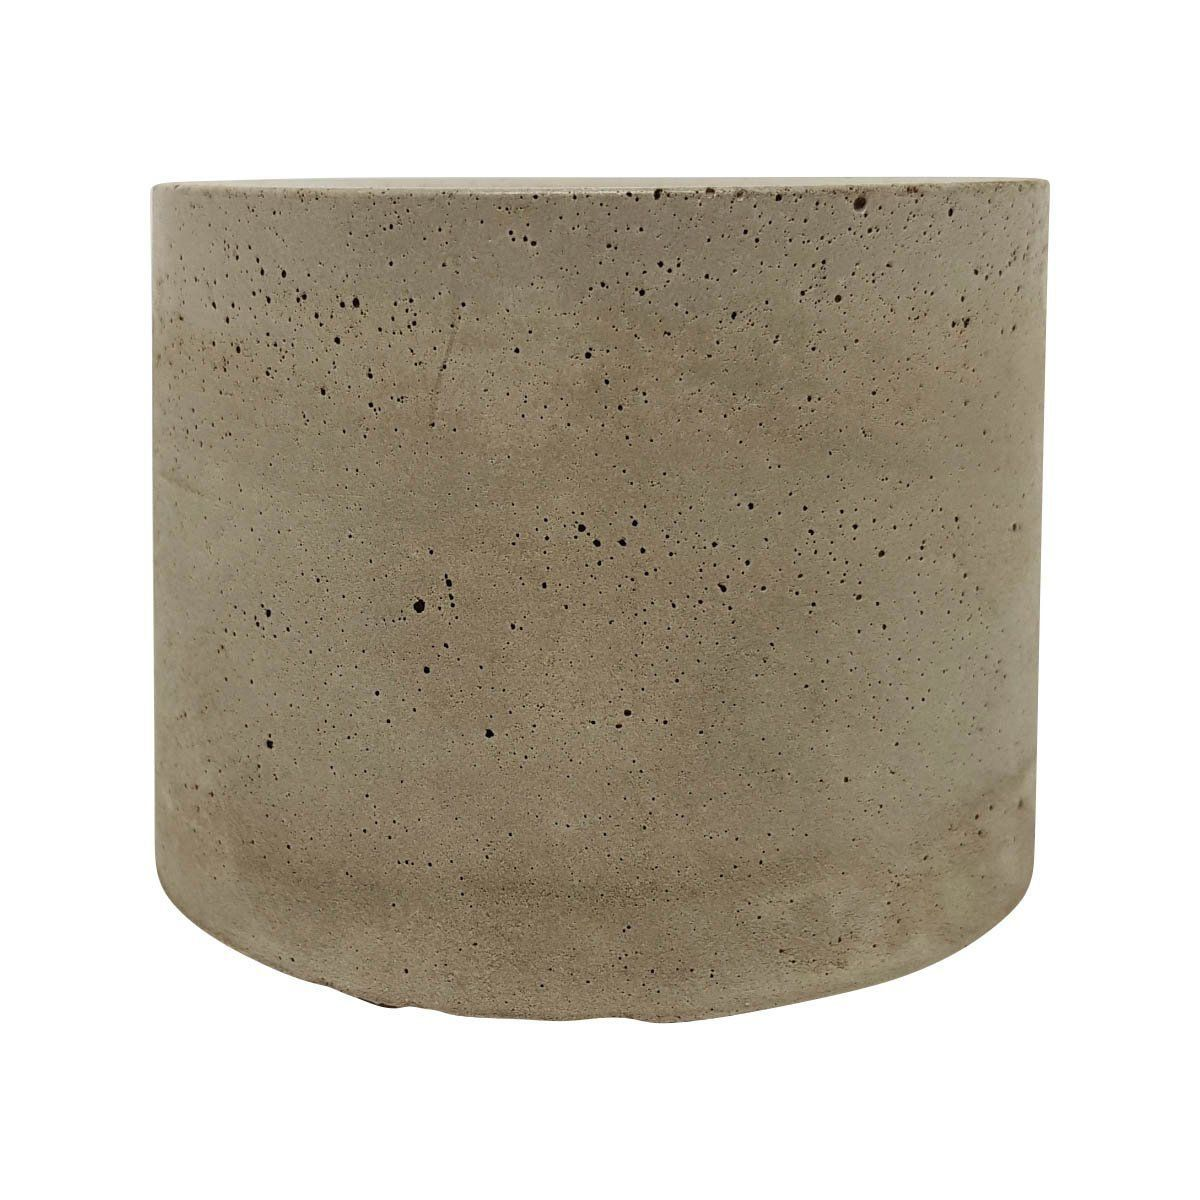 Vaso de cimento 6,5cm x 8cm MD01